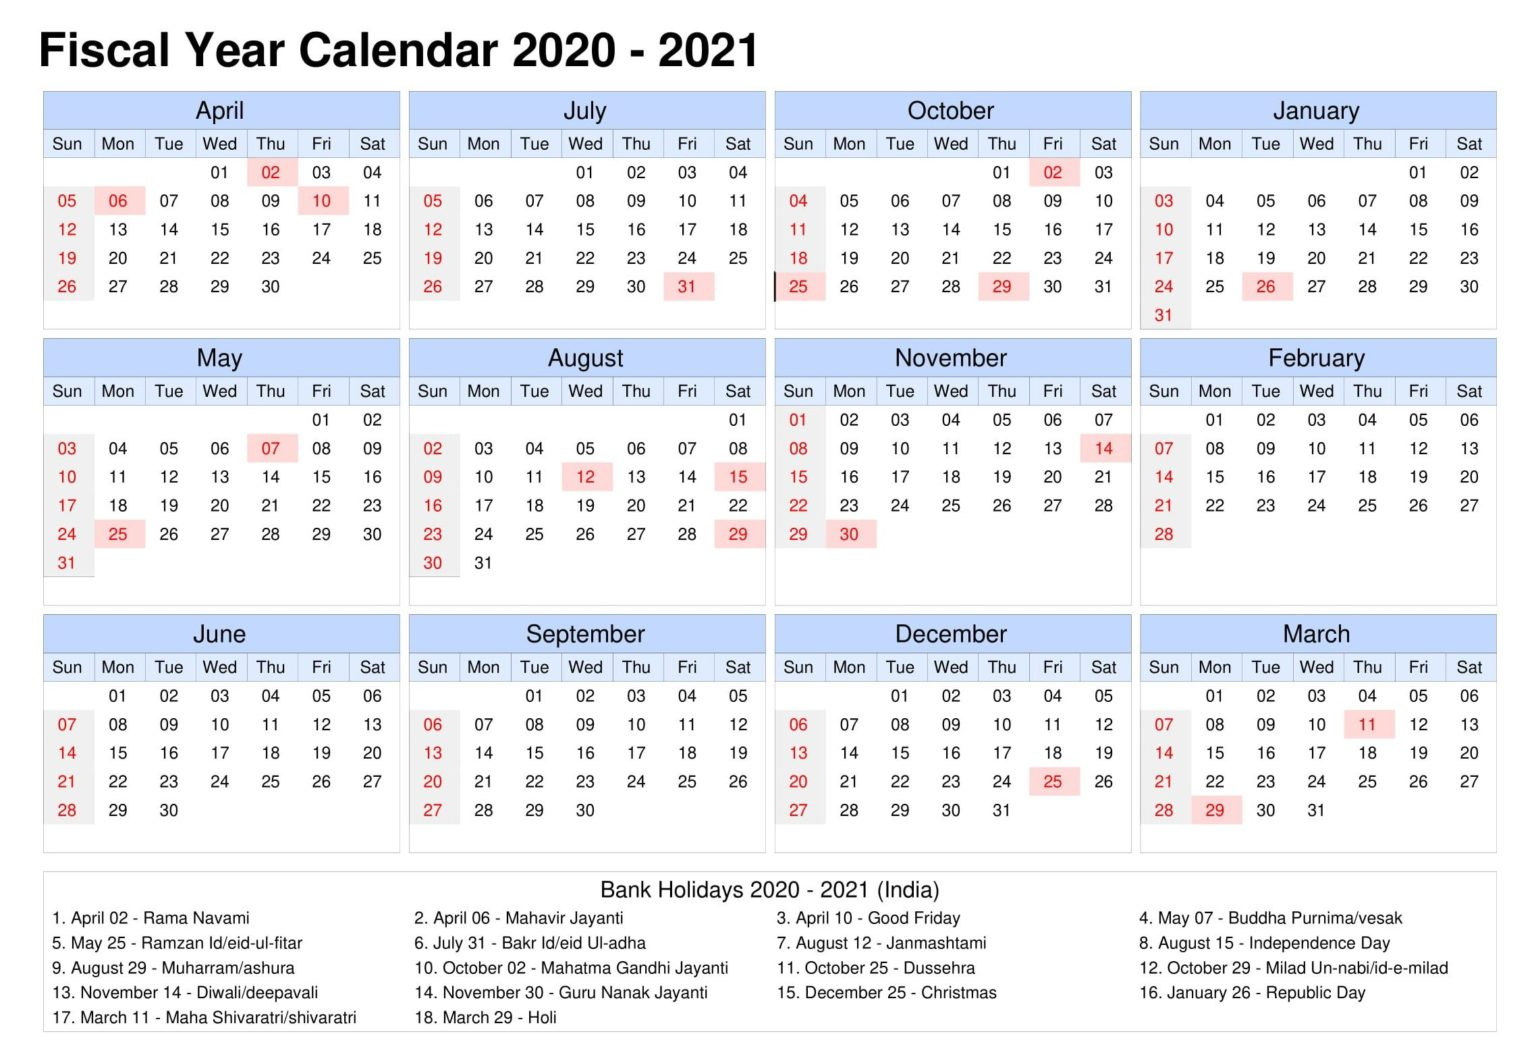 2021 Blank Holidays Calendar